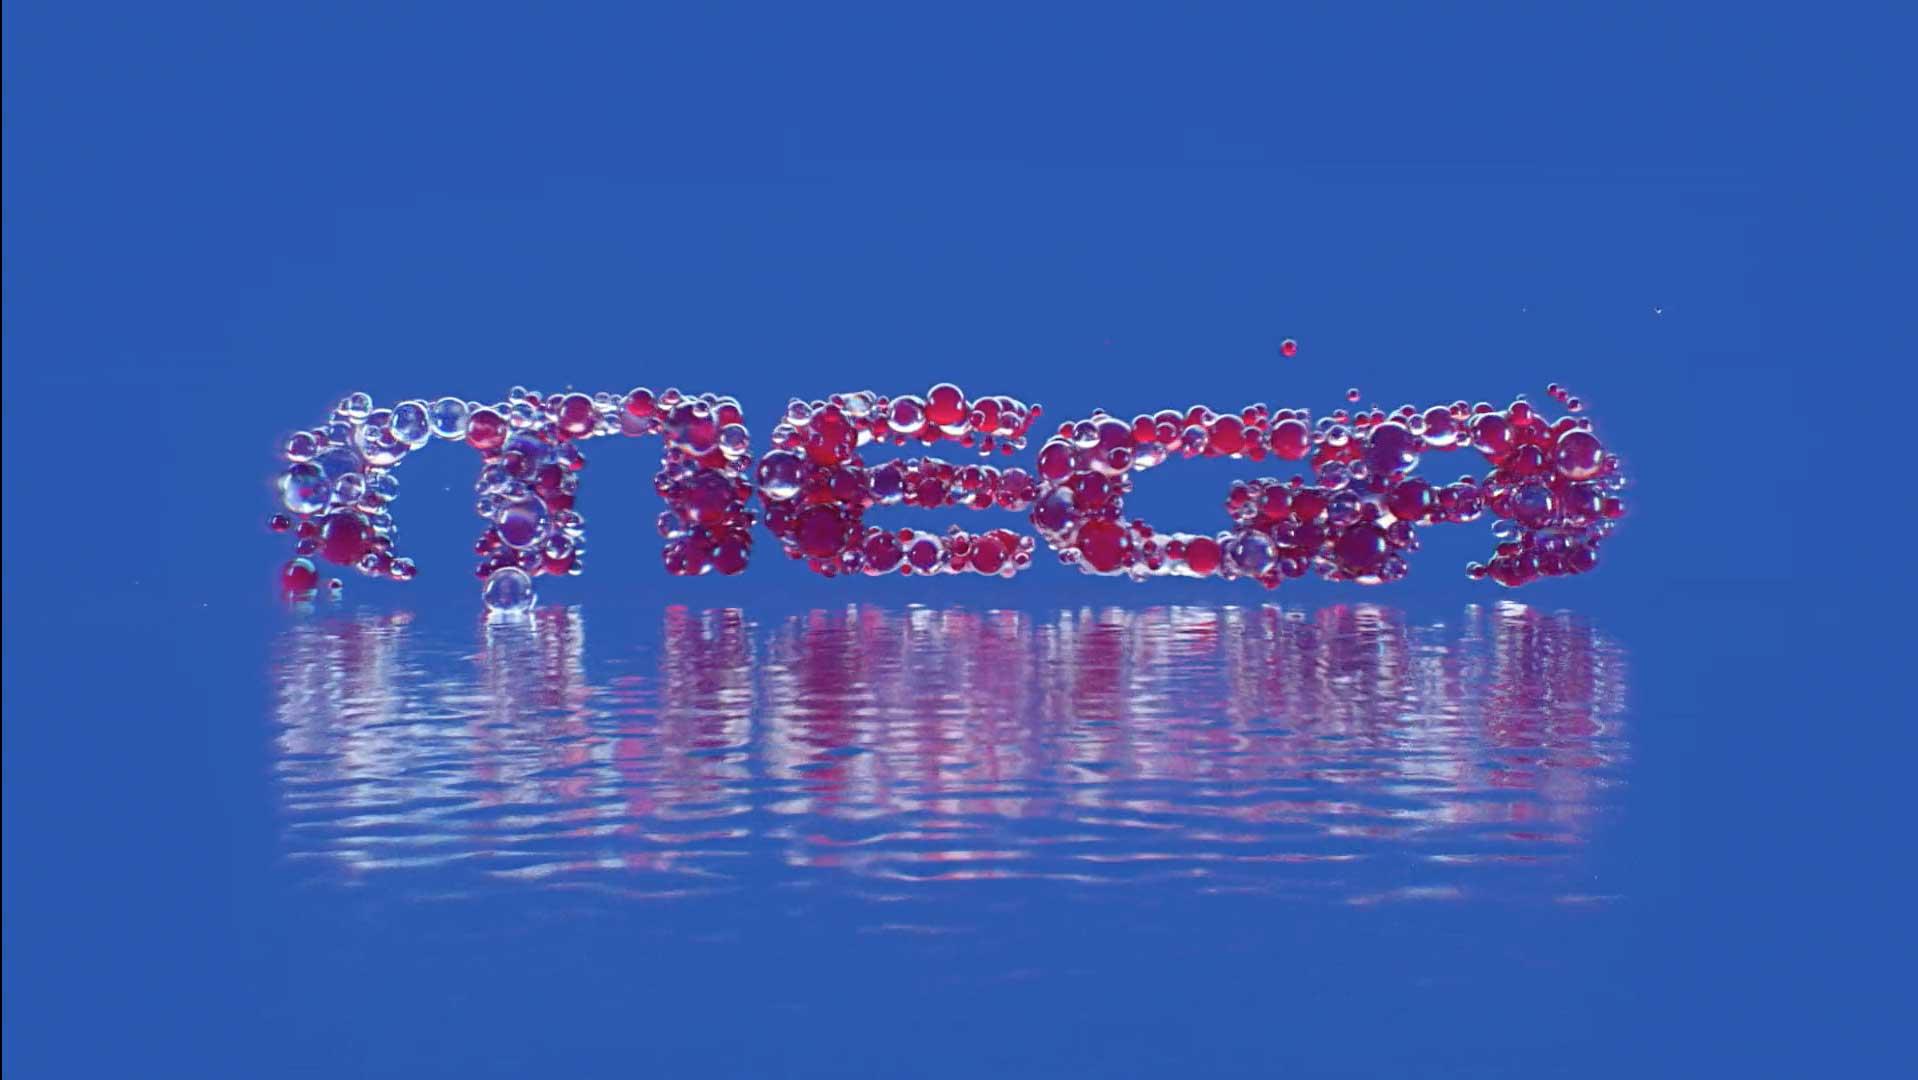 MEGA TV Idents by Yeti Pictures | STASH MAGAZINE